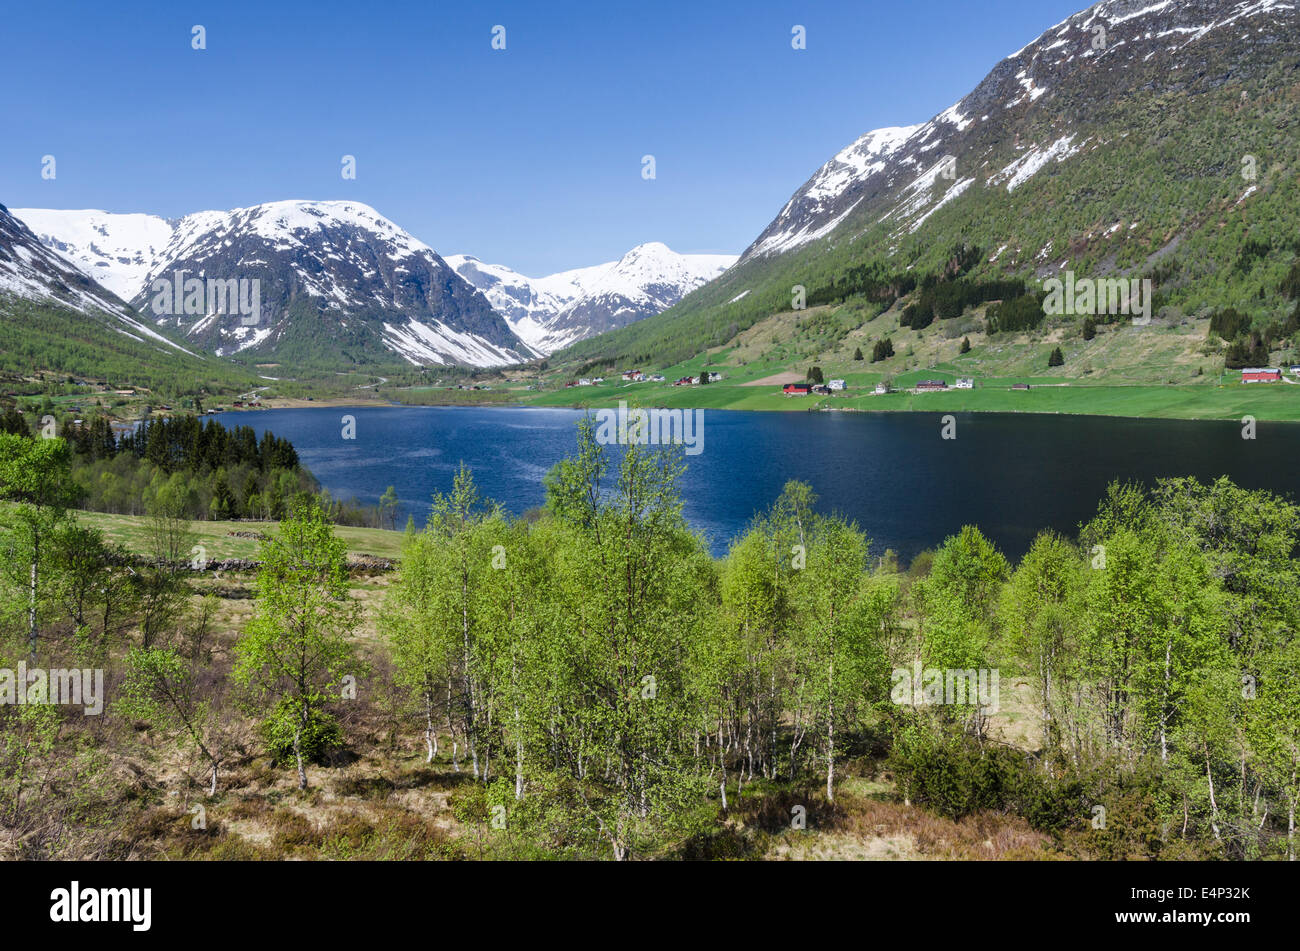 Landschaft am See Dalavatnet, Sogndal, Sogn og Fjordane Fylke, Norwegen - Stock Image